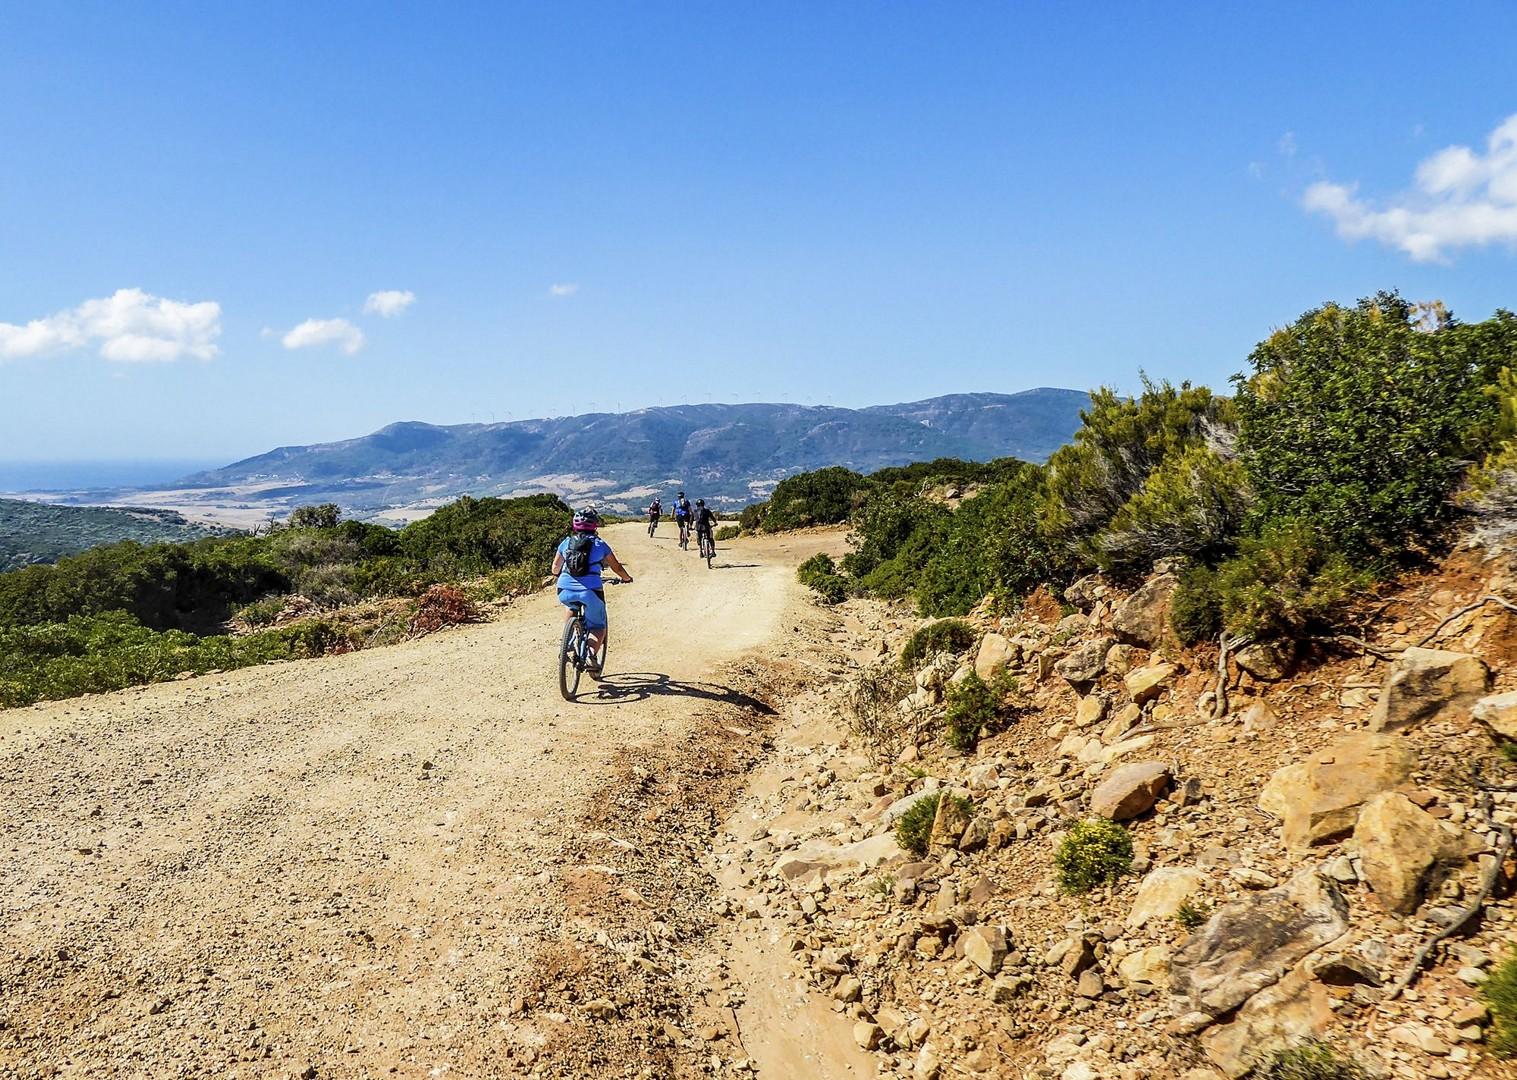 rocky-chutes-el-chorro-spain-mountain-biking-skedaddle.jpg - Spain - Awesome Andalucia - Guided Mountain Bike Holiday - Mountain Biking